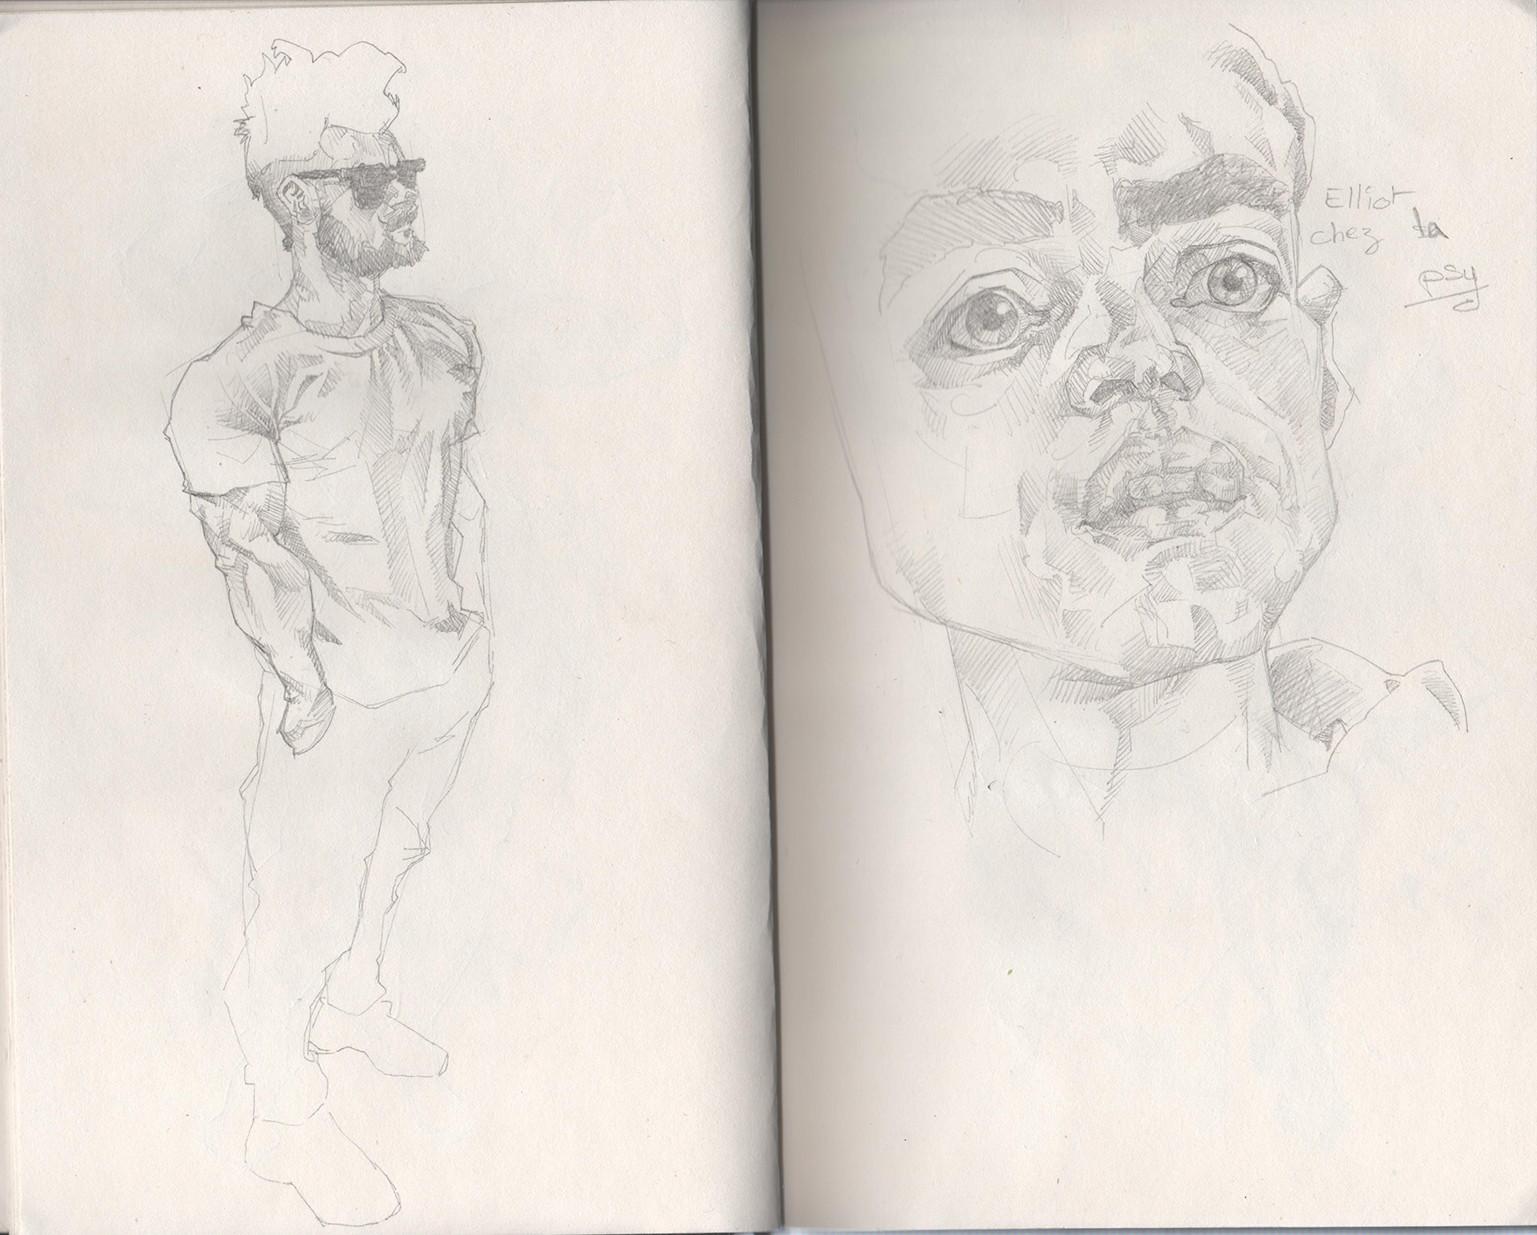 Tony gbeulie post sketch7